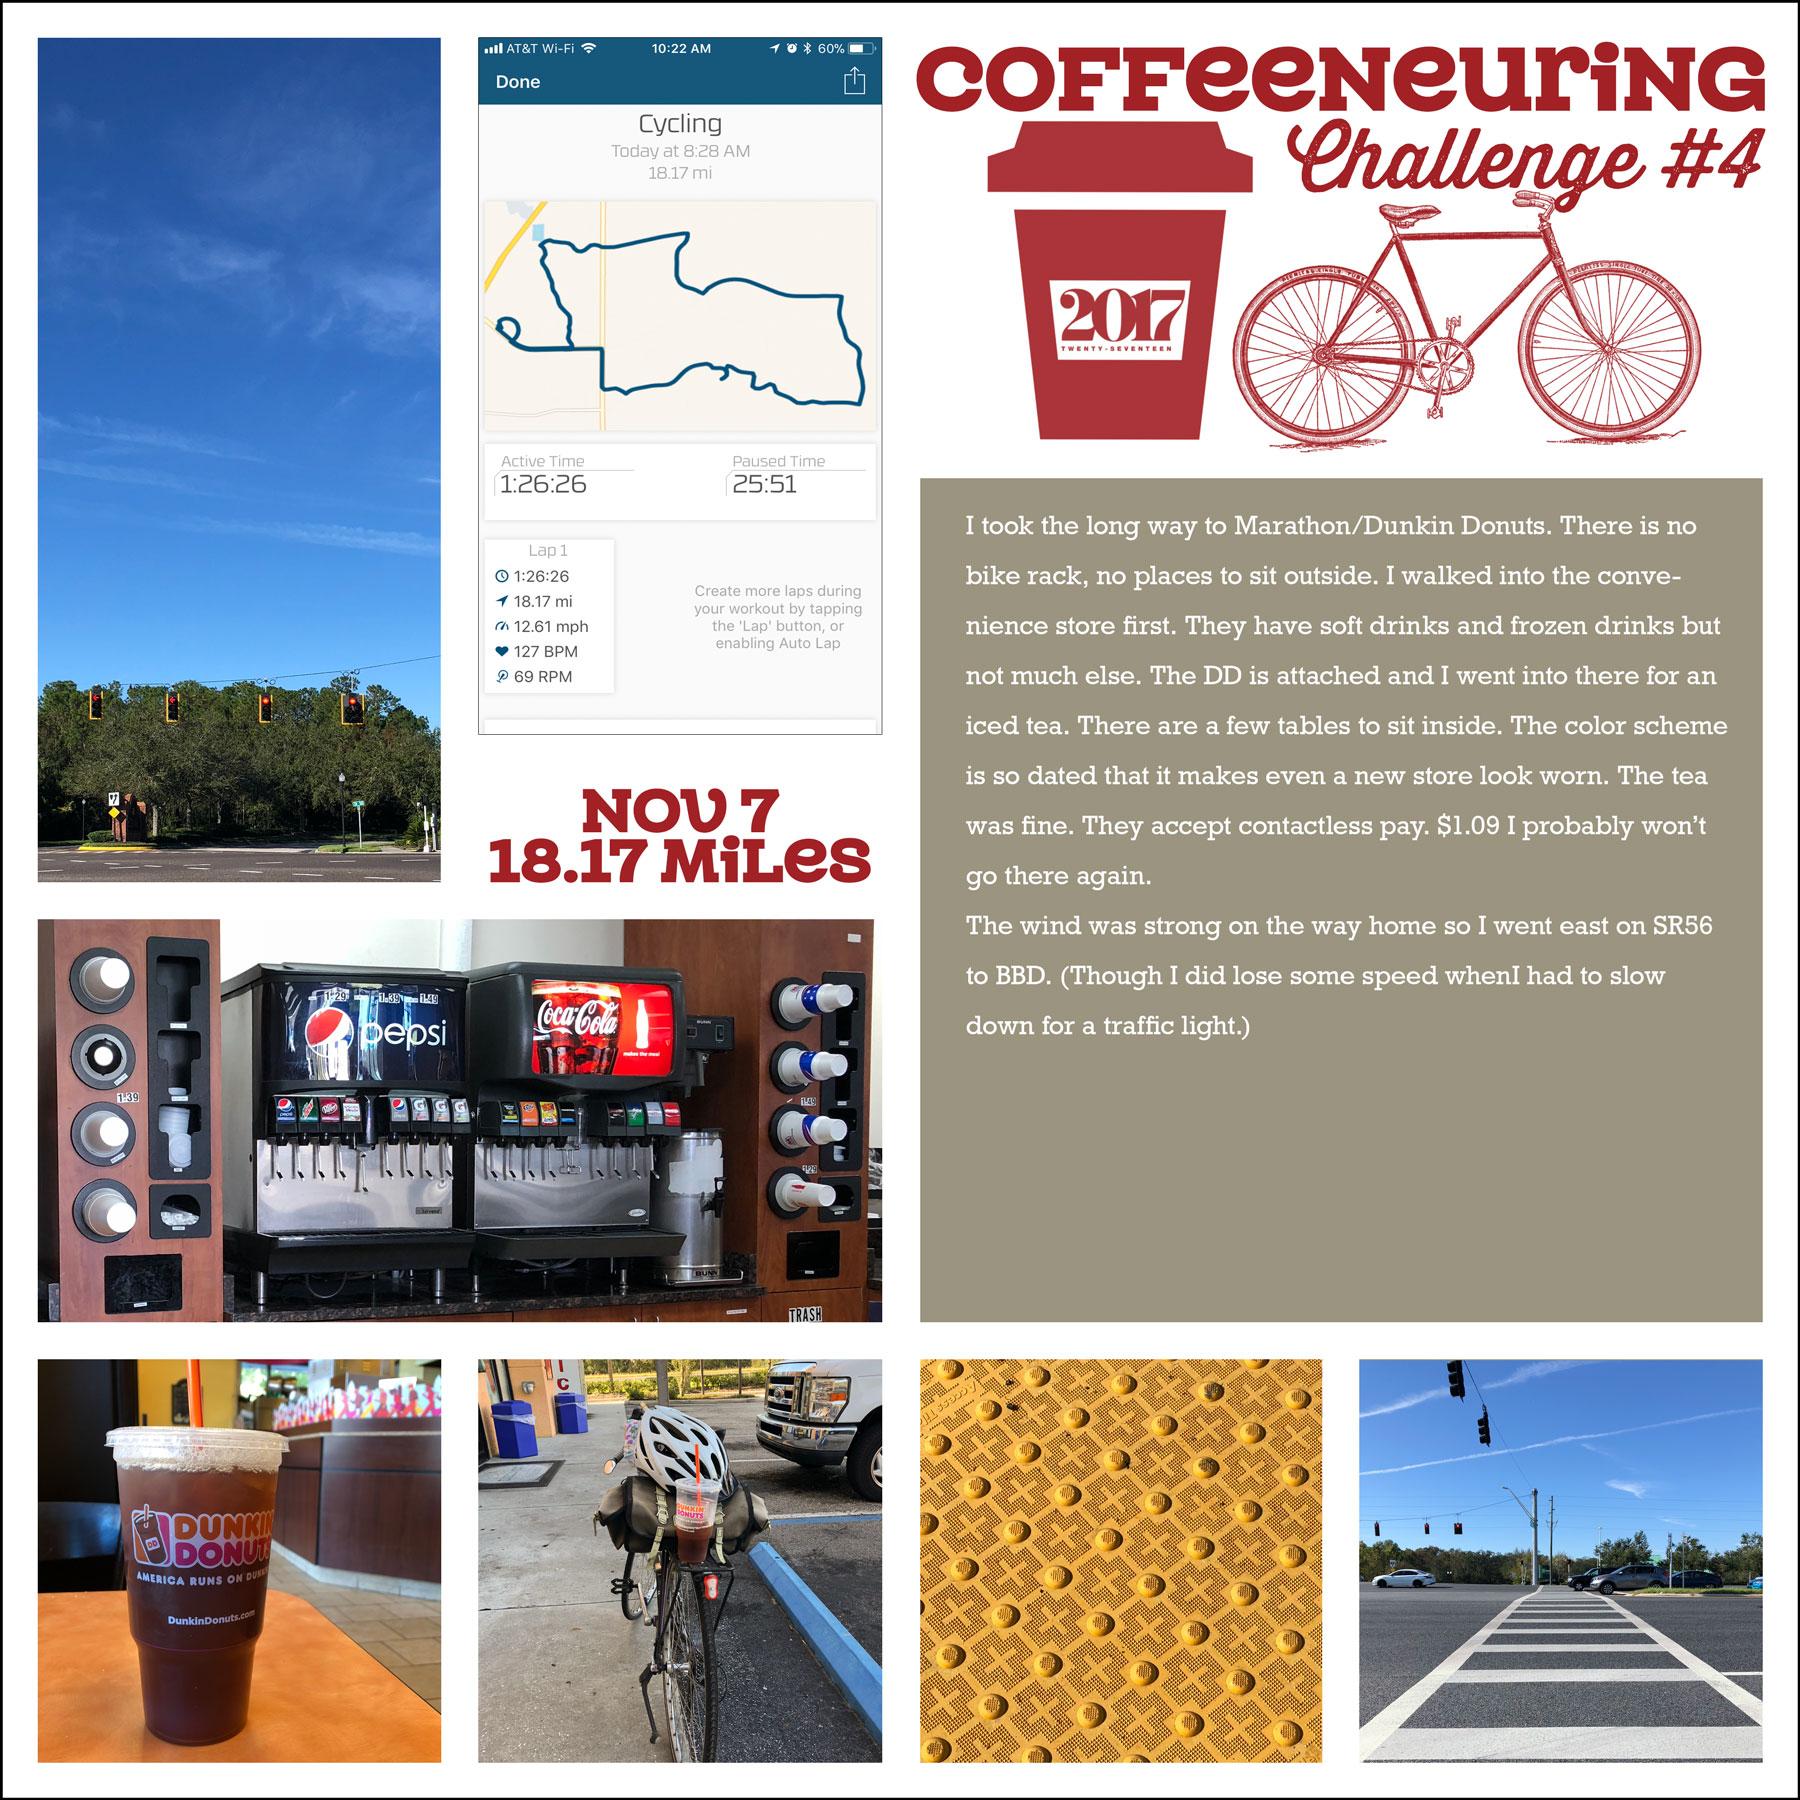 20171107-coffeeneuring.jpg